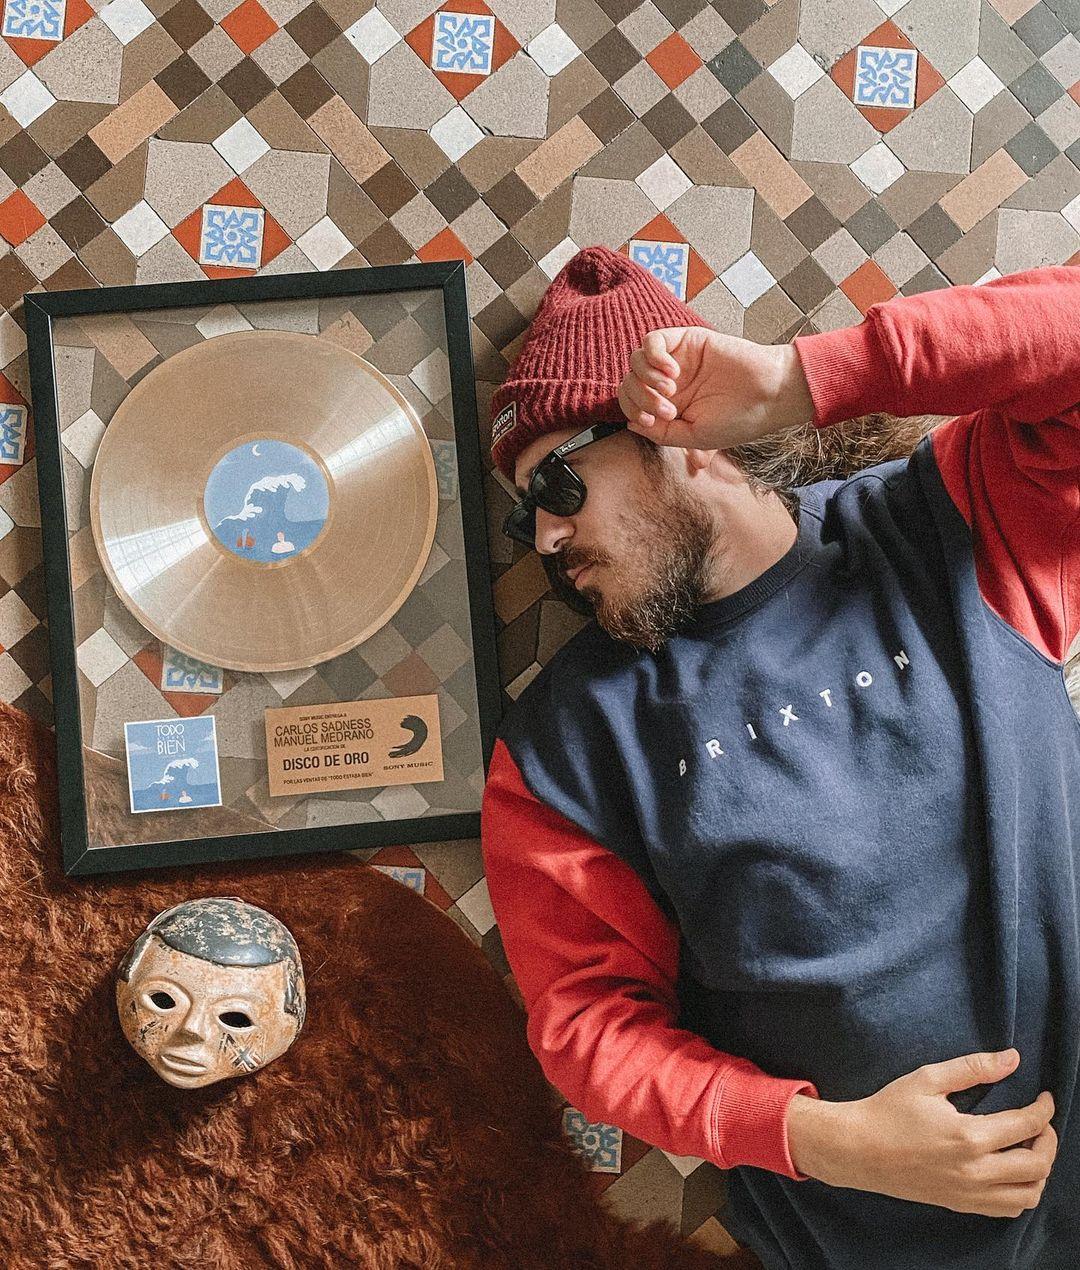 Carlos Sadness Disco de Oro